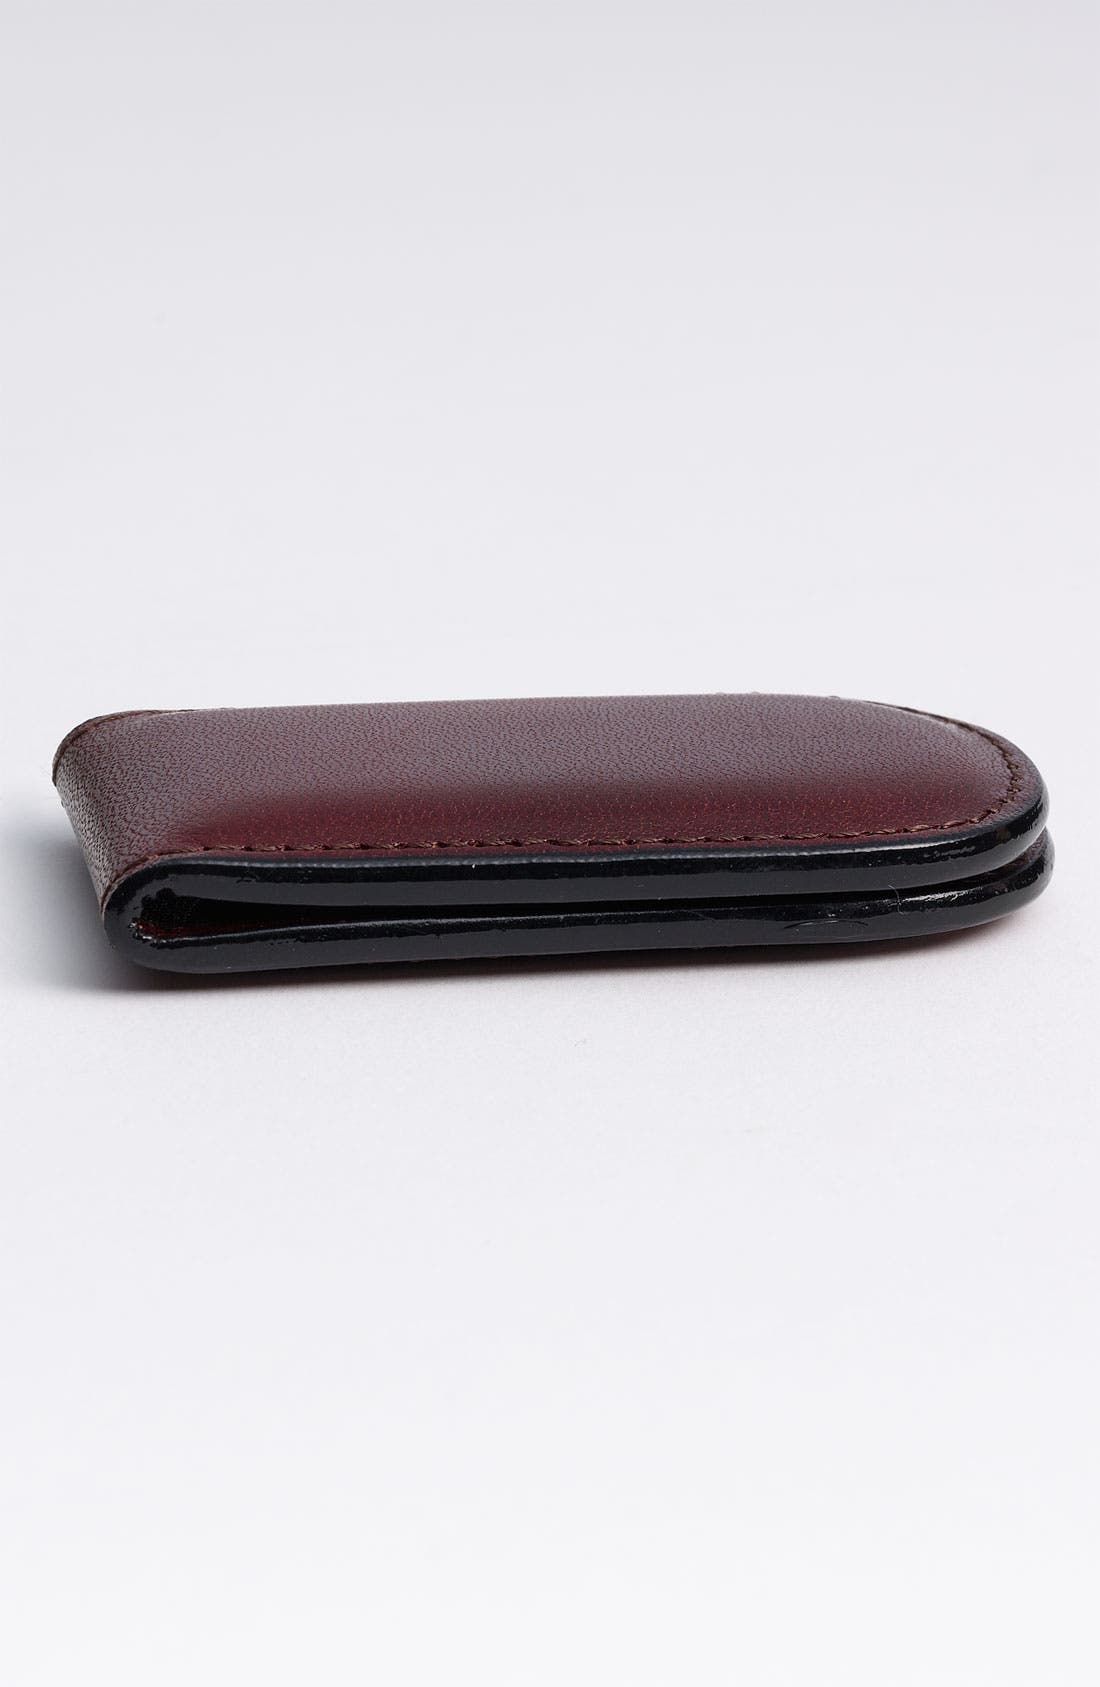 Alternate Image 2  - Bosca Leather Money Clip